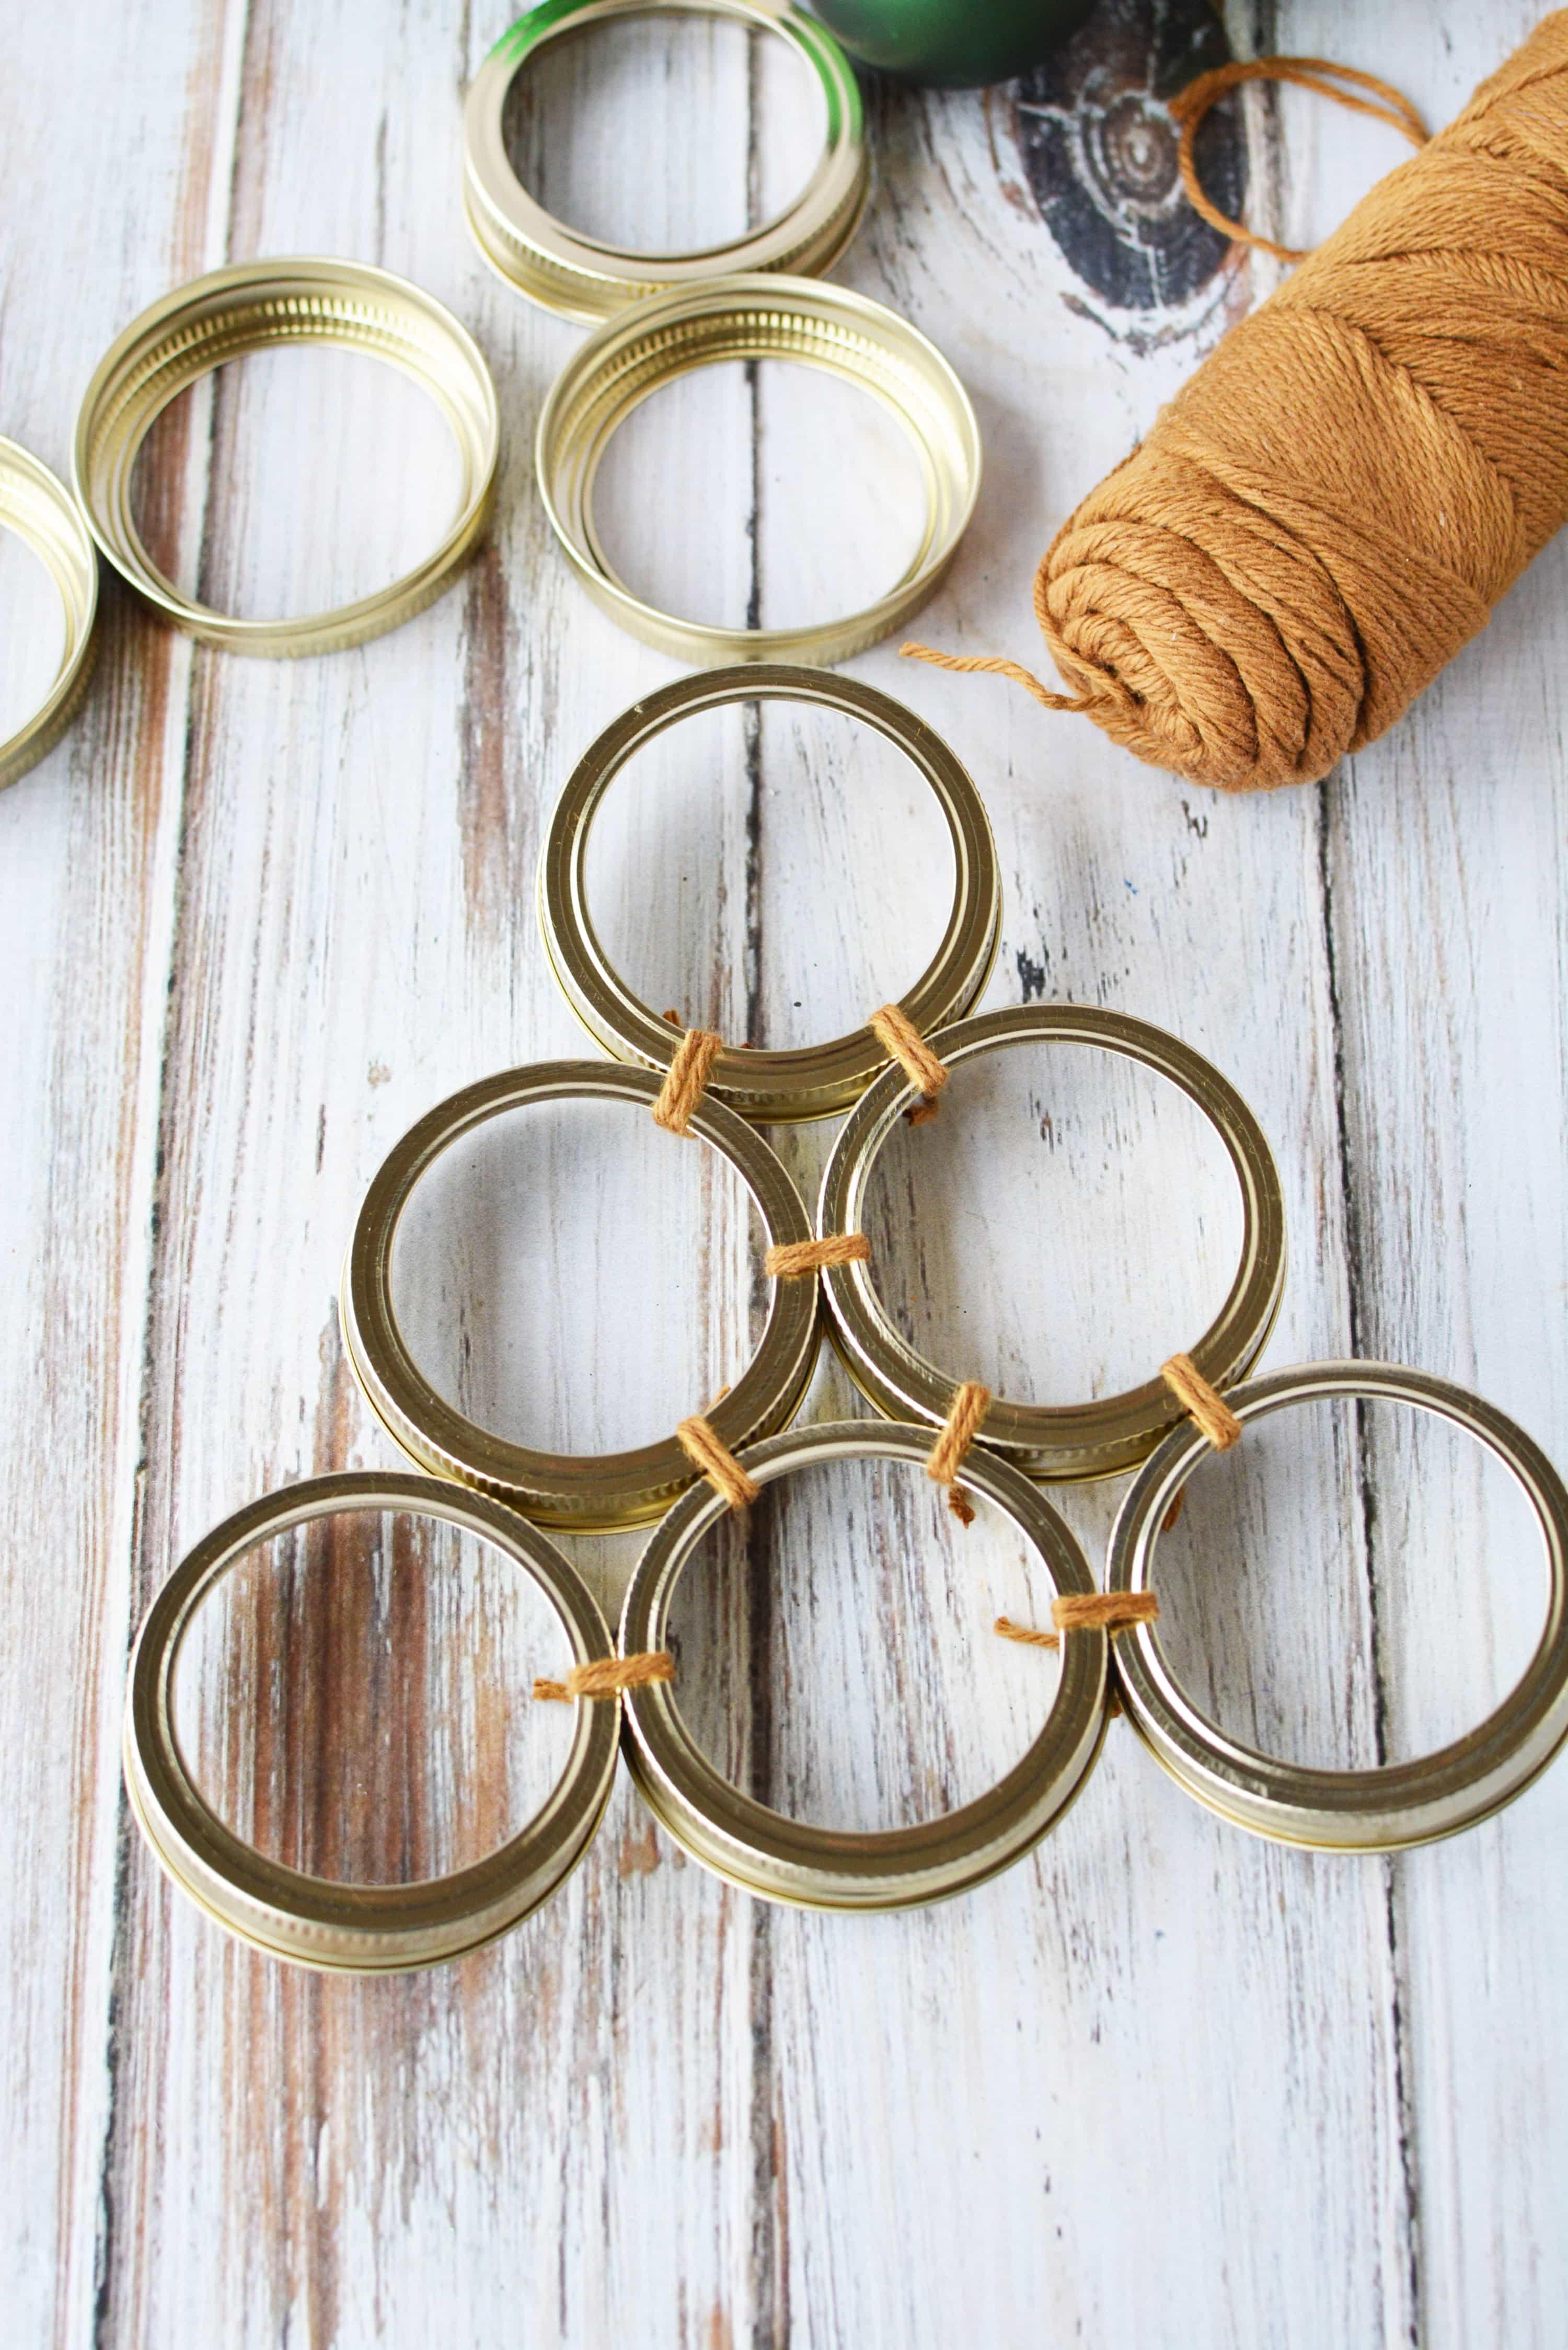 how to make a Mason Jar Lid Wreath | Christmas Wreath Tutorial using Mason Jar Lids | Holiday Mason Jar Crafts